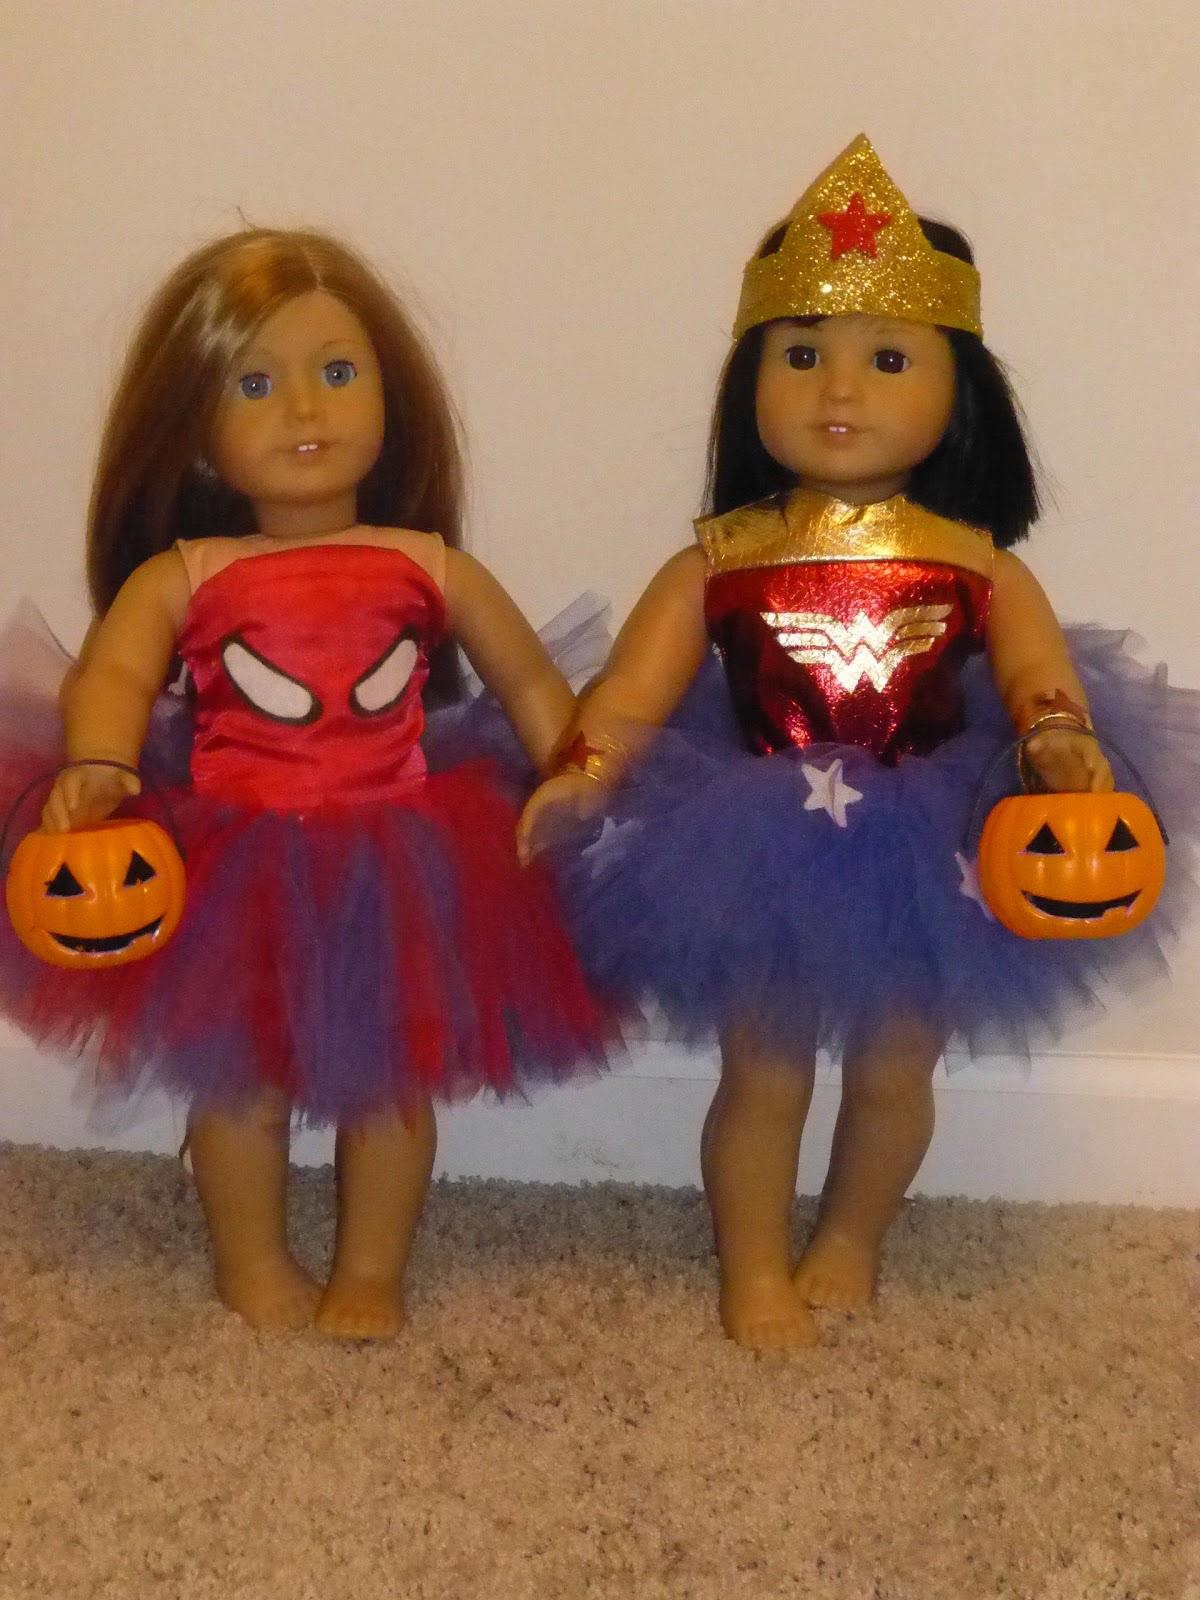 Theresa\u002639;s Mixed Nuts: American Girl Superheros